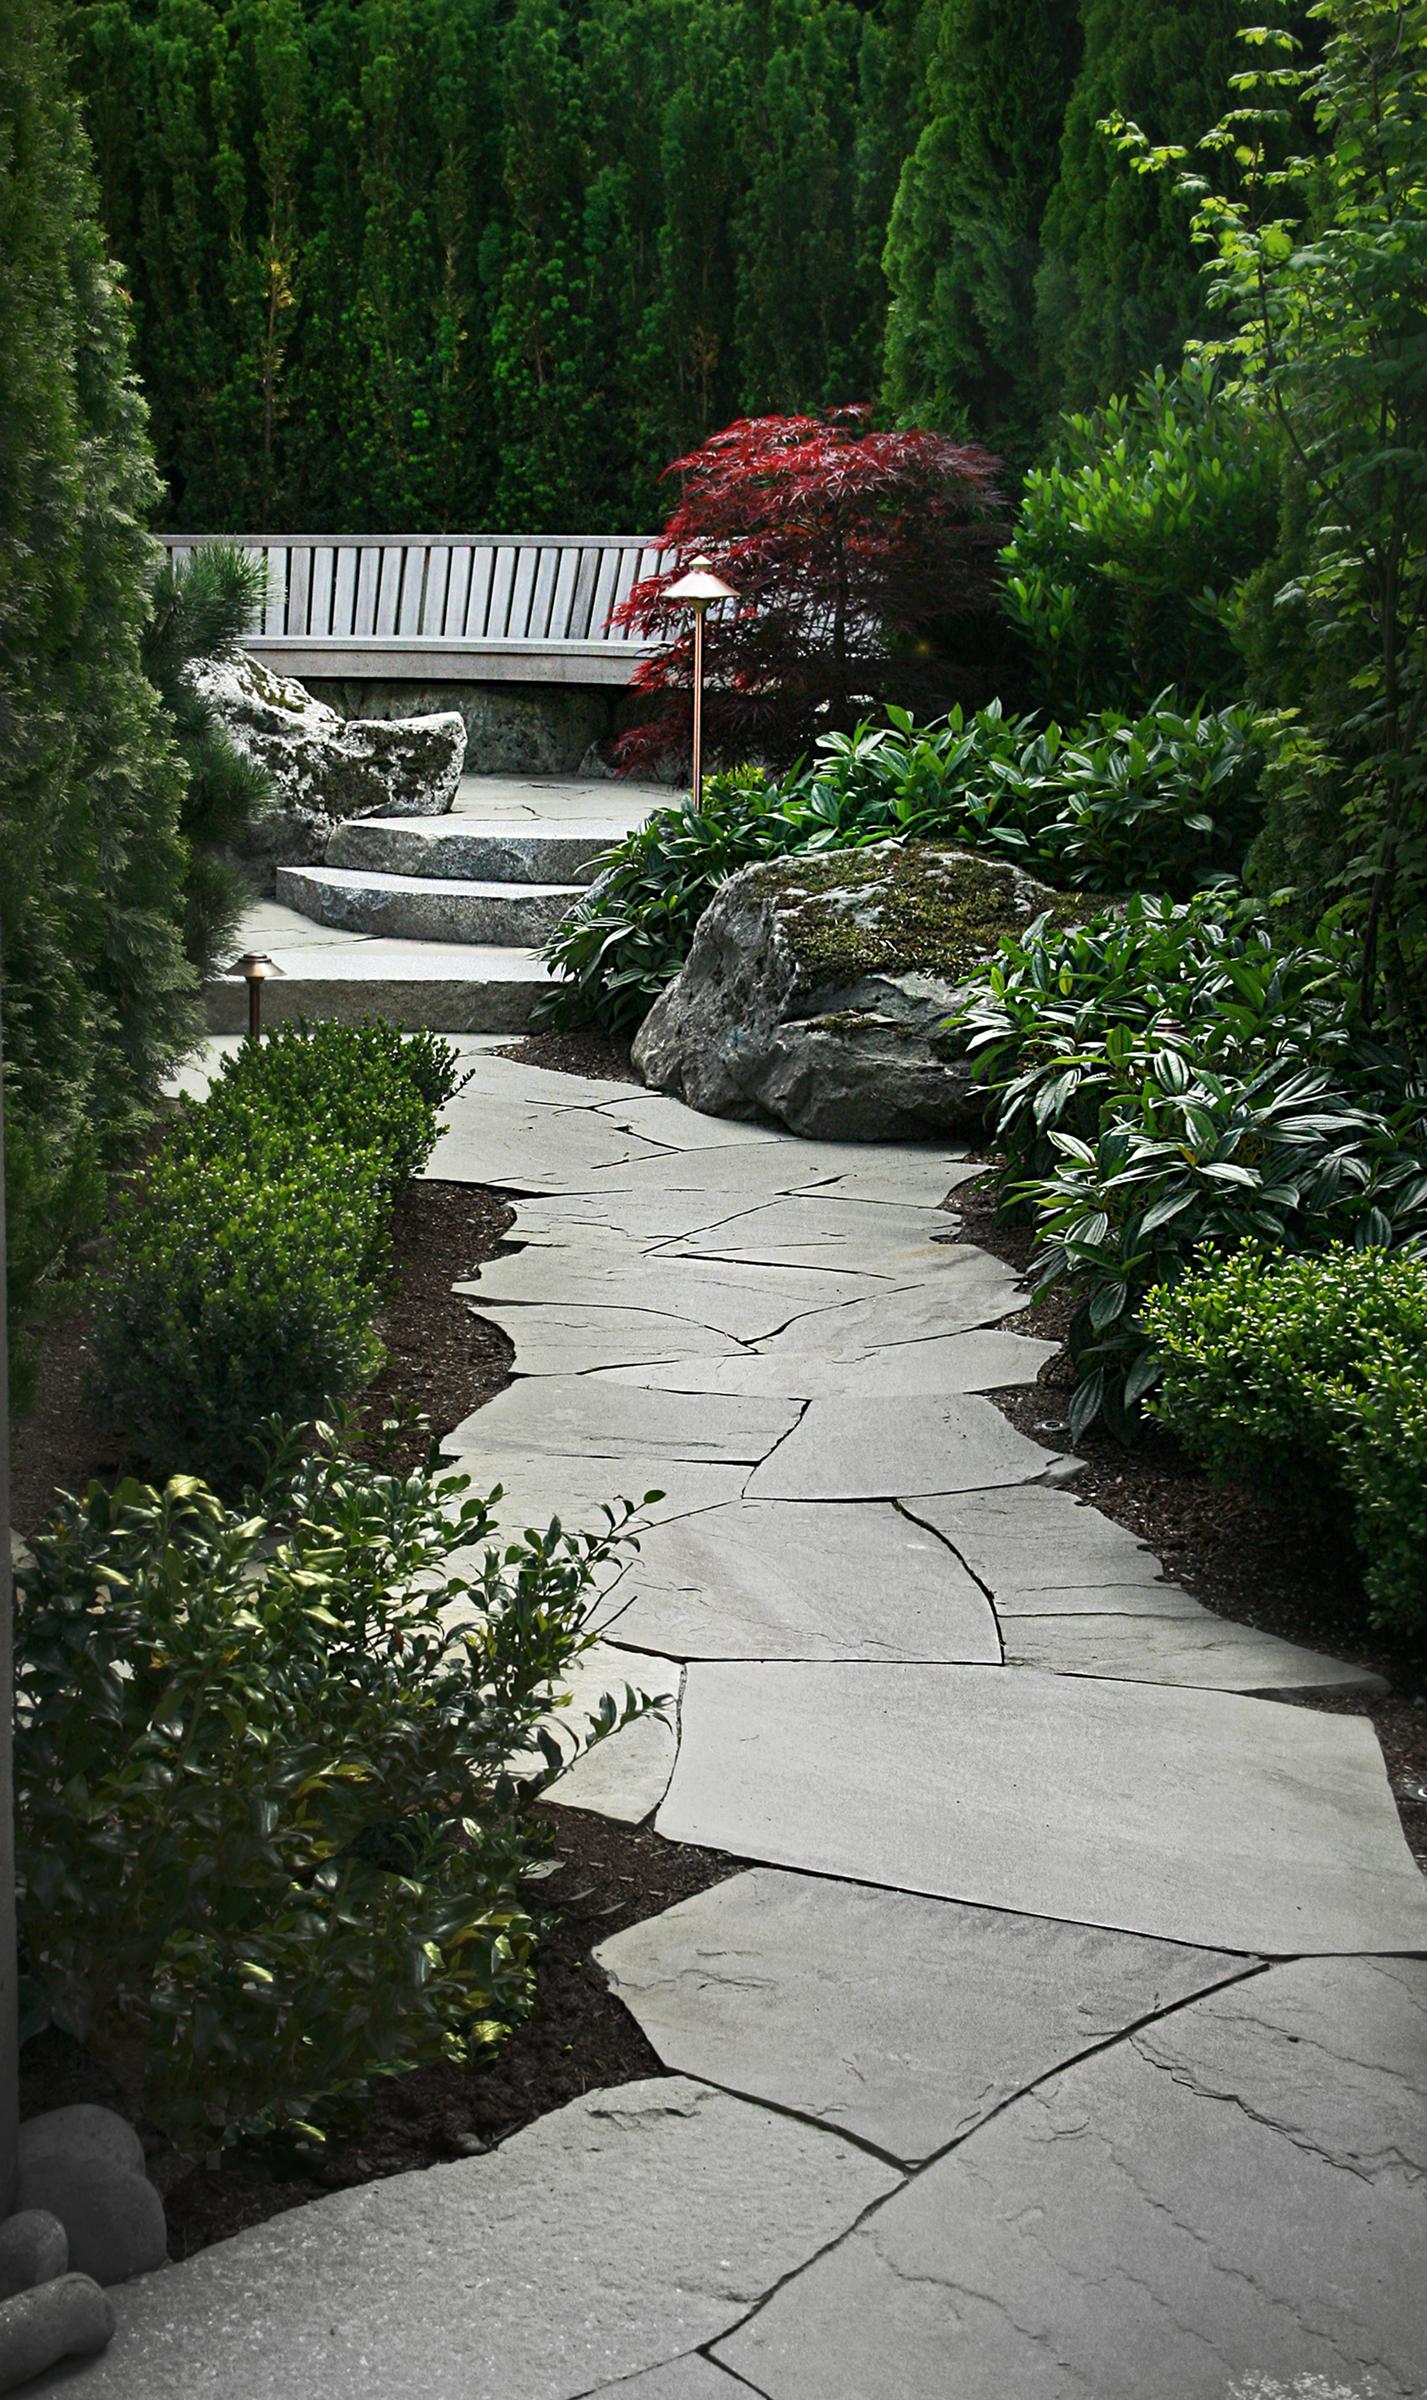 Walks, Steps, & Patios -